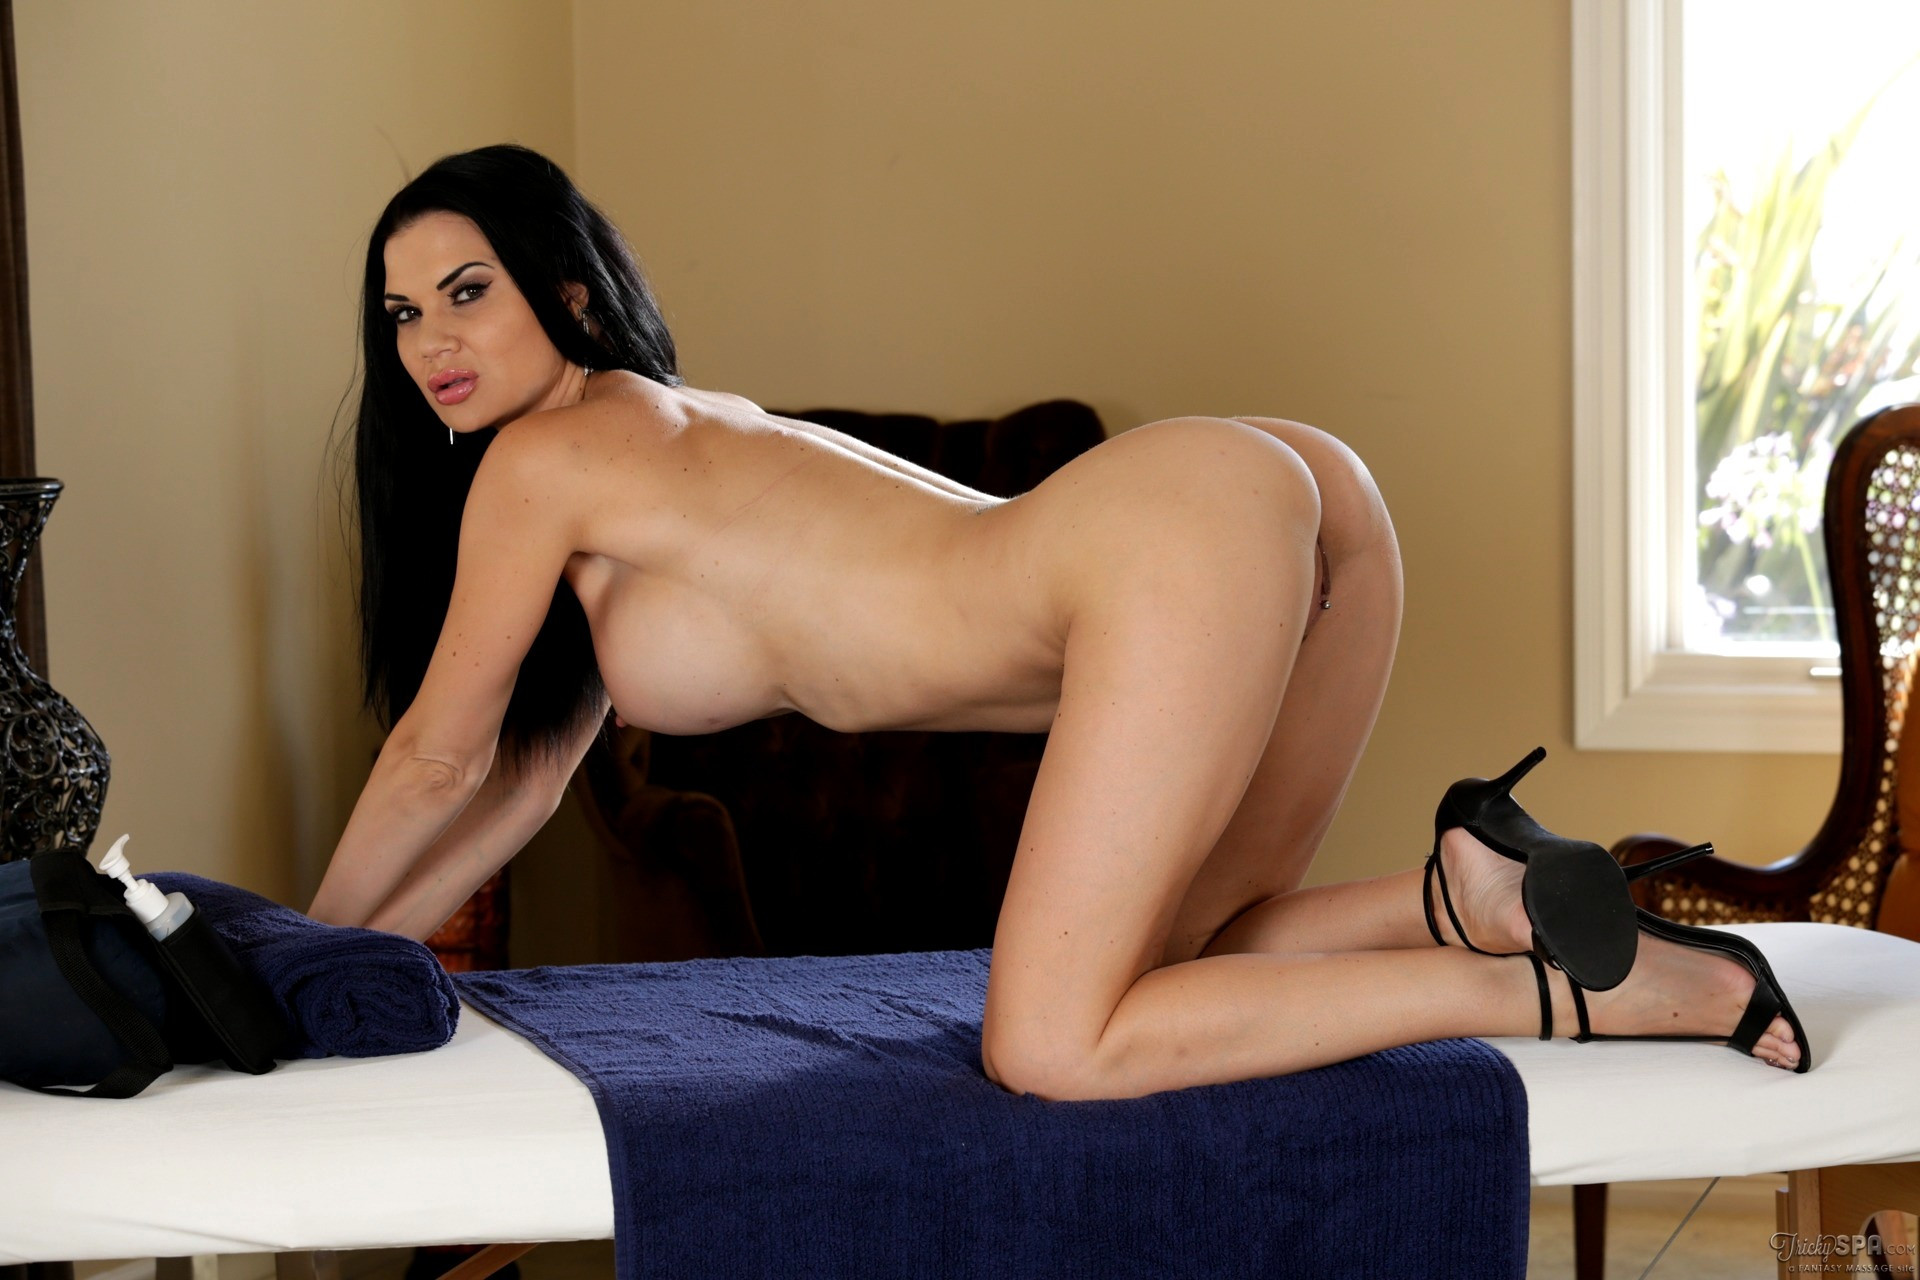 Tricky Spa Jasmine Jae Satisfied Massage Vr Porn Sex Hd Pics-2883